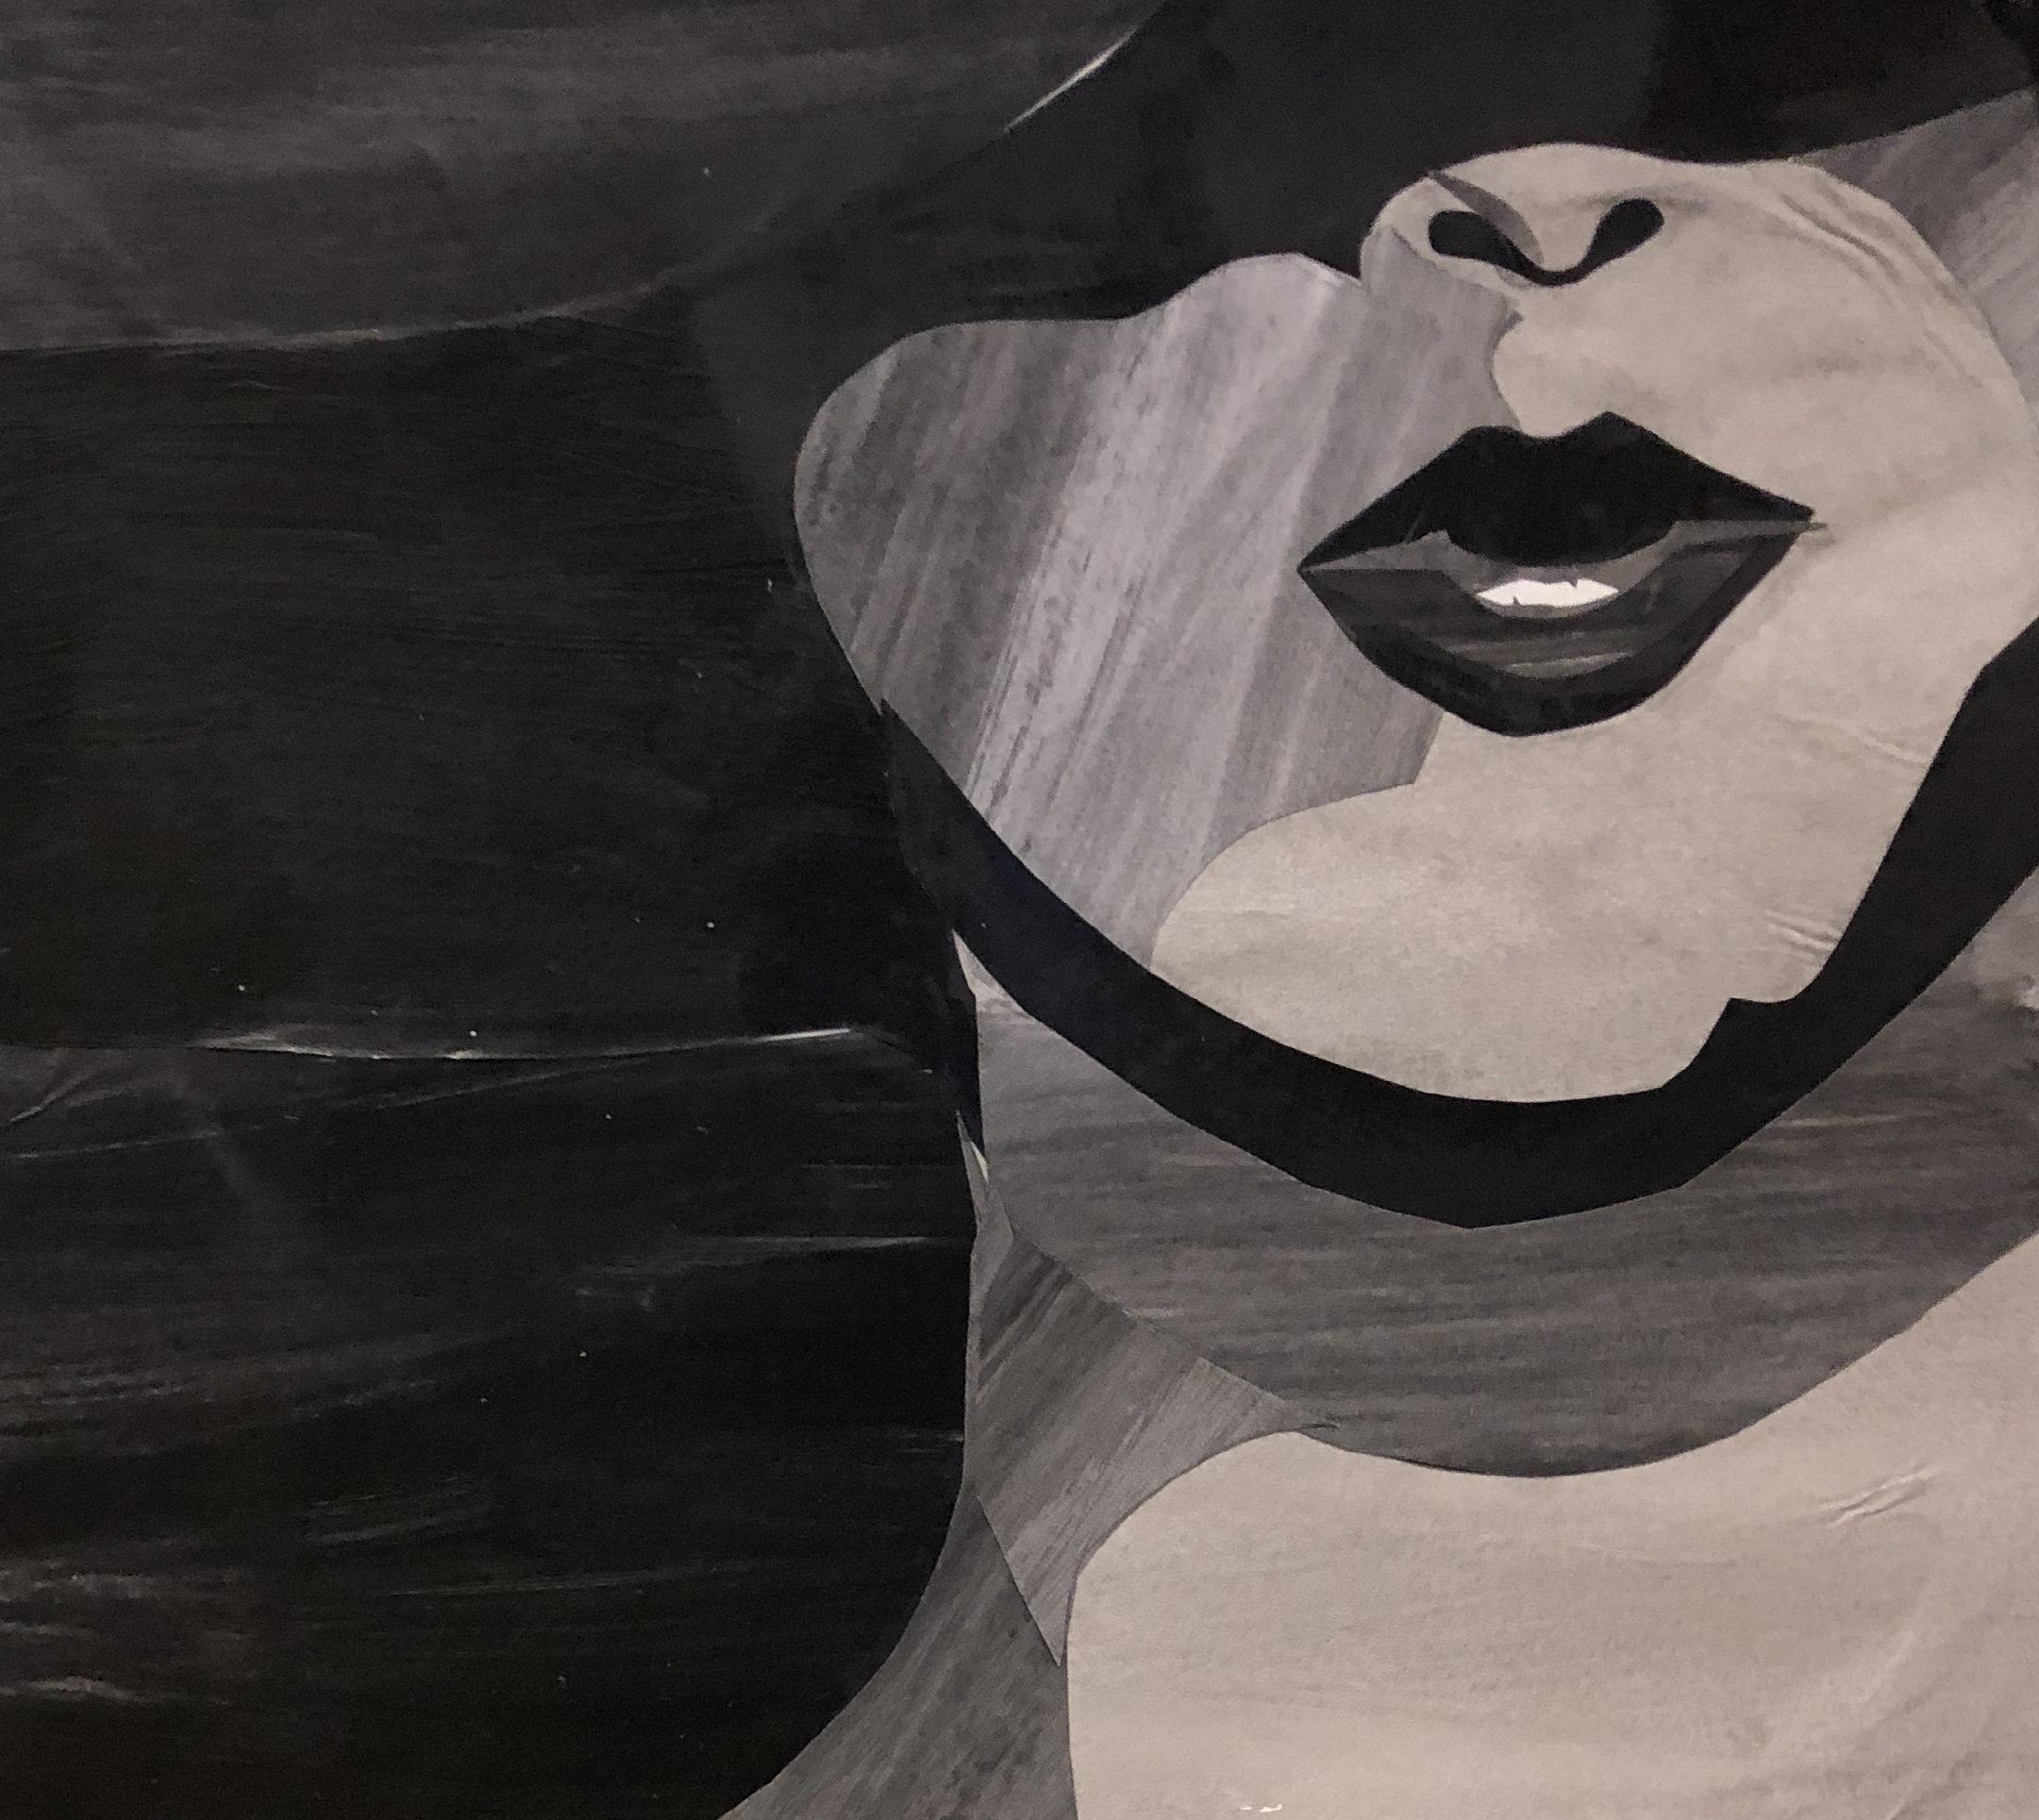 Art by Jordan Pillsbury